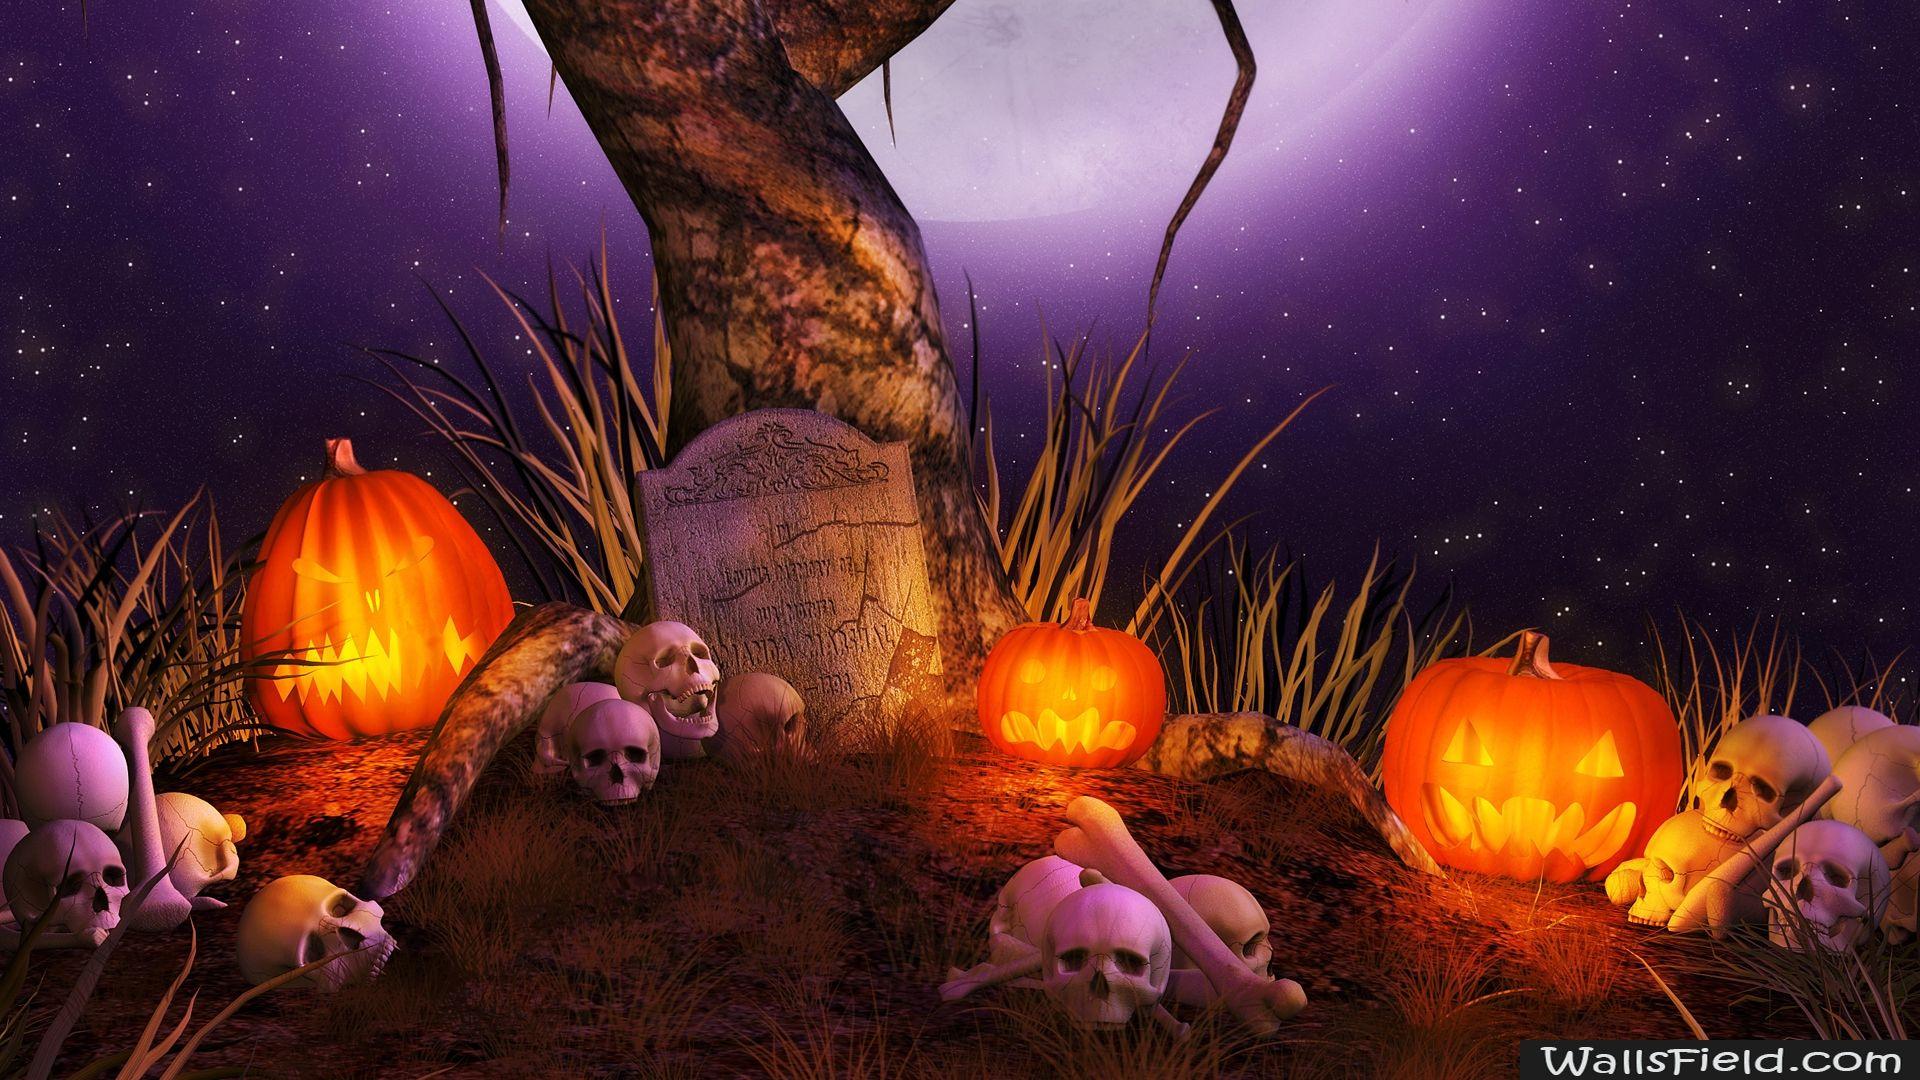 Cemetery Of Halloween Wallsfield Com Free Hd Wallpapers Halloween Facts Free Halloween Wallpaper Halloween Wallpaper